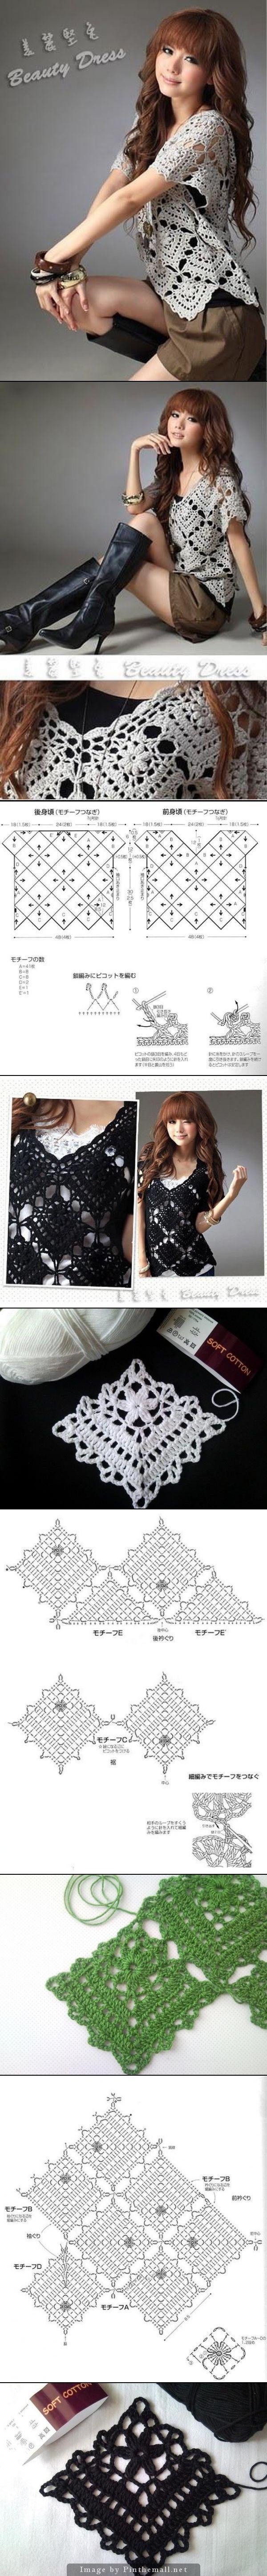 Crochet motif pullover - created via http://pinthemall.net